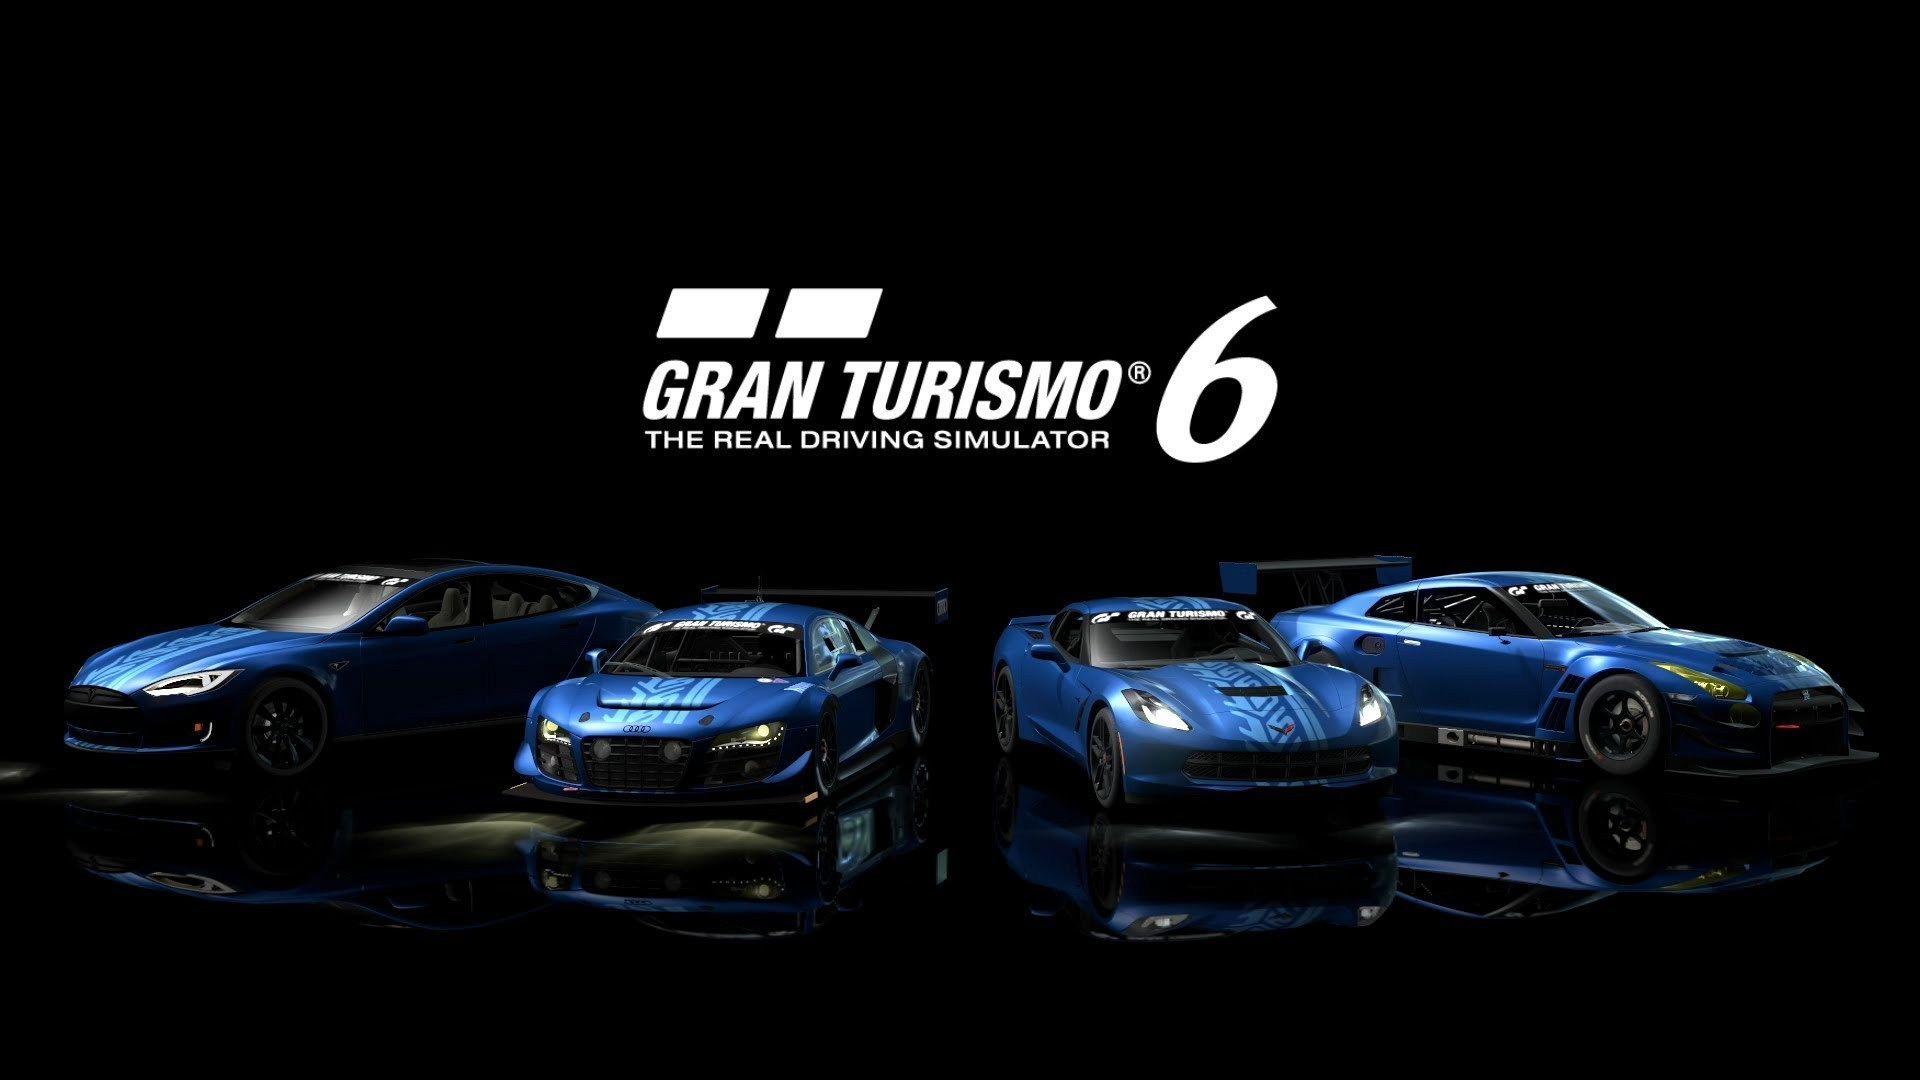 Gran Turismo Wallpaper Hd: Gran Turismo 6 Wallpaper Hd